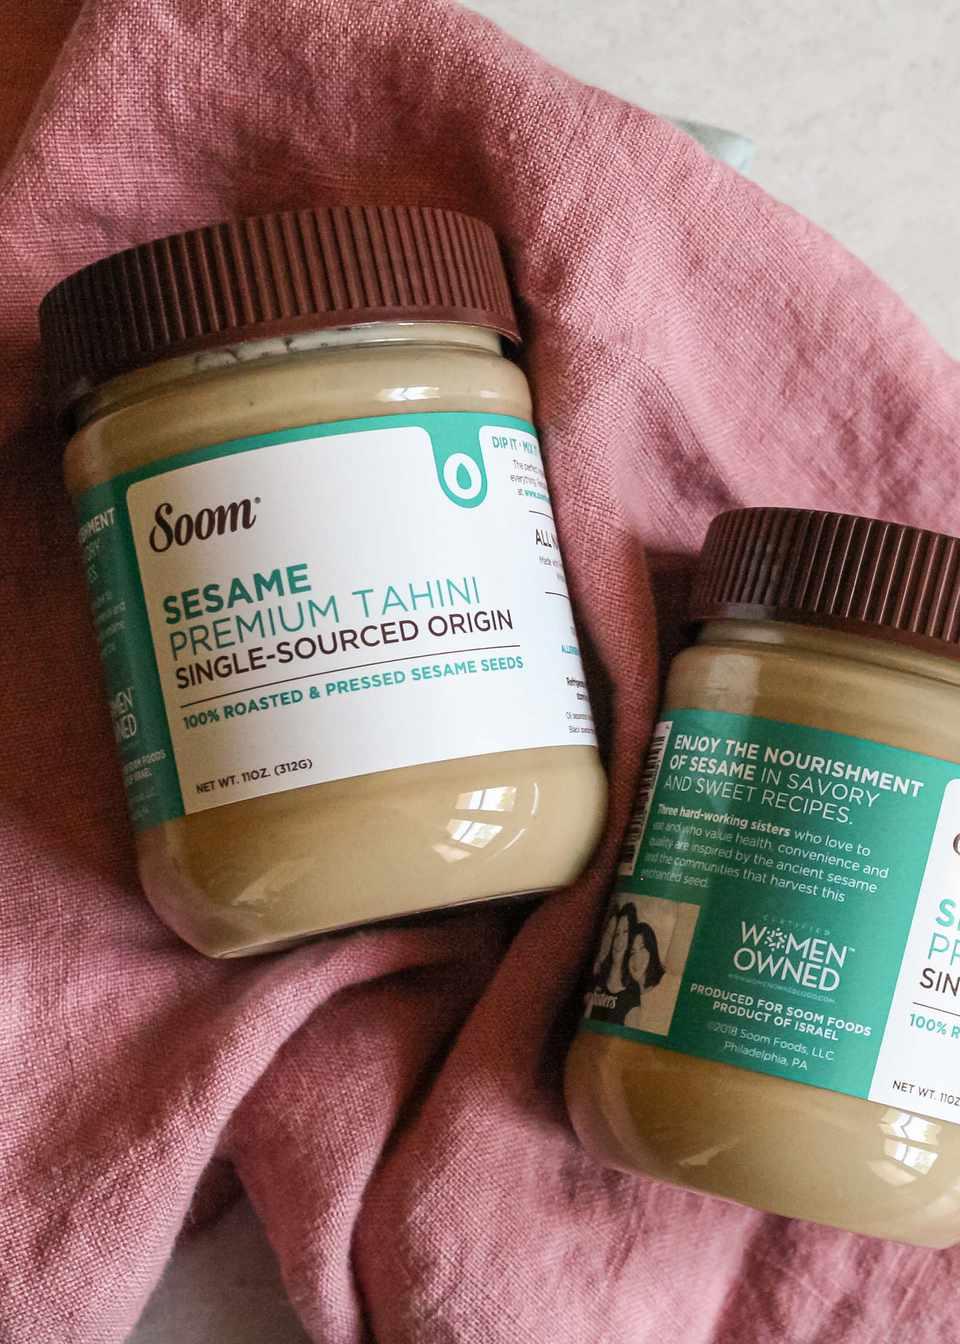 Two jars of Soom tahini on a pink linen.